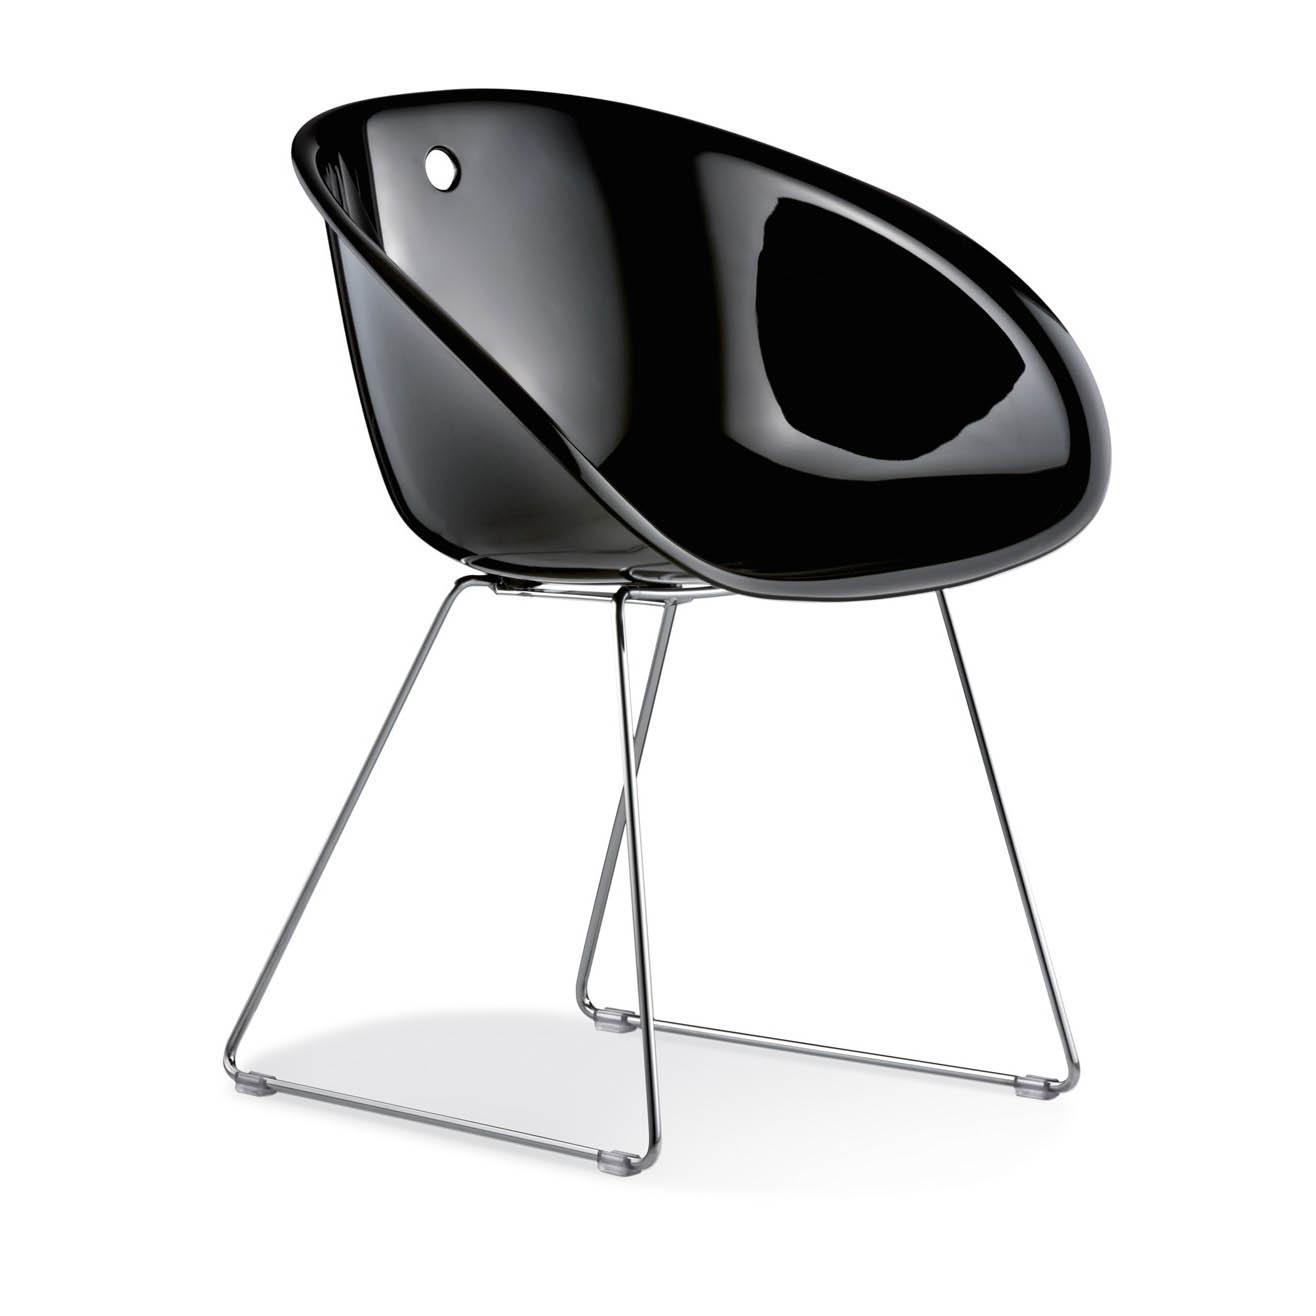 Výprodej Pop up Home židle Gliss Sledge (černá, podnož crom)